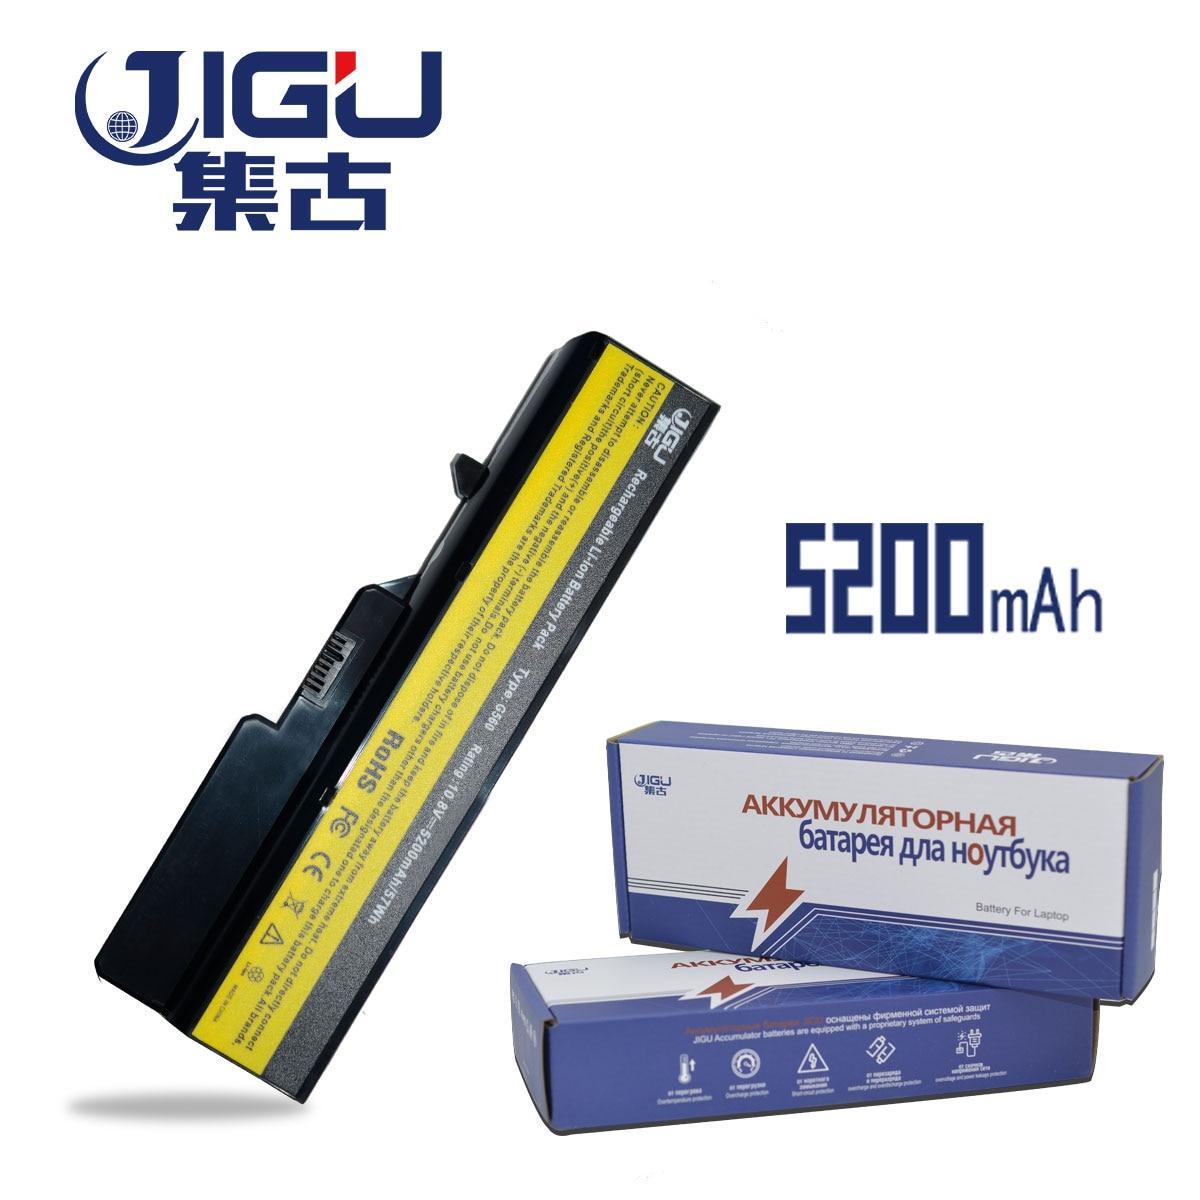 JIGU 6 Cell Laptop Battery 57Y6454 57Y6455 L09C6Y02 L09M6Y02 L09S6Y02 L10C6Y02 For Lenovo IdeaPad G460 G560 V360 V370 V470 Z460